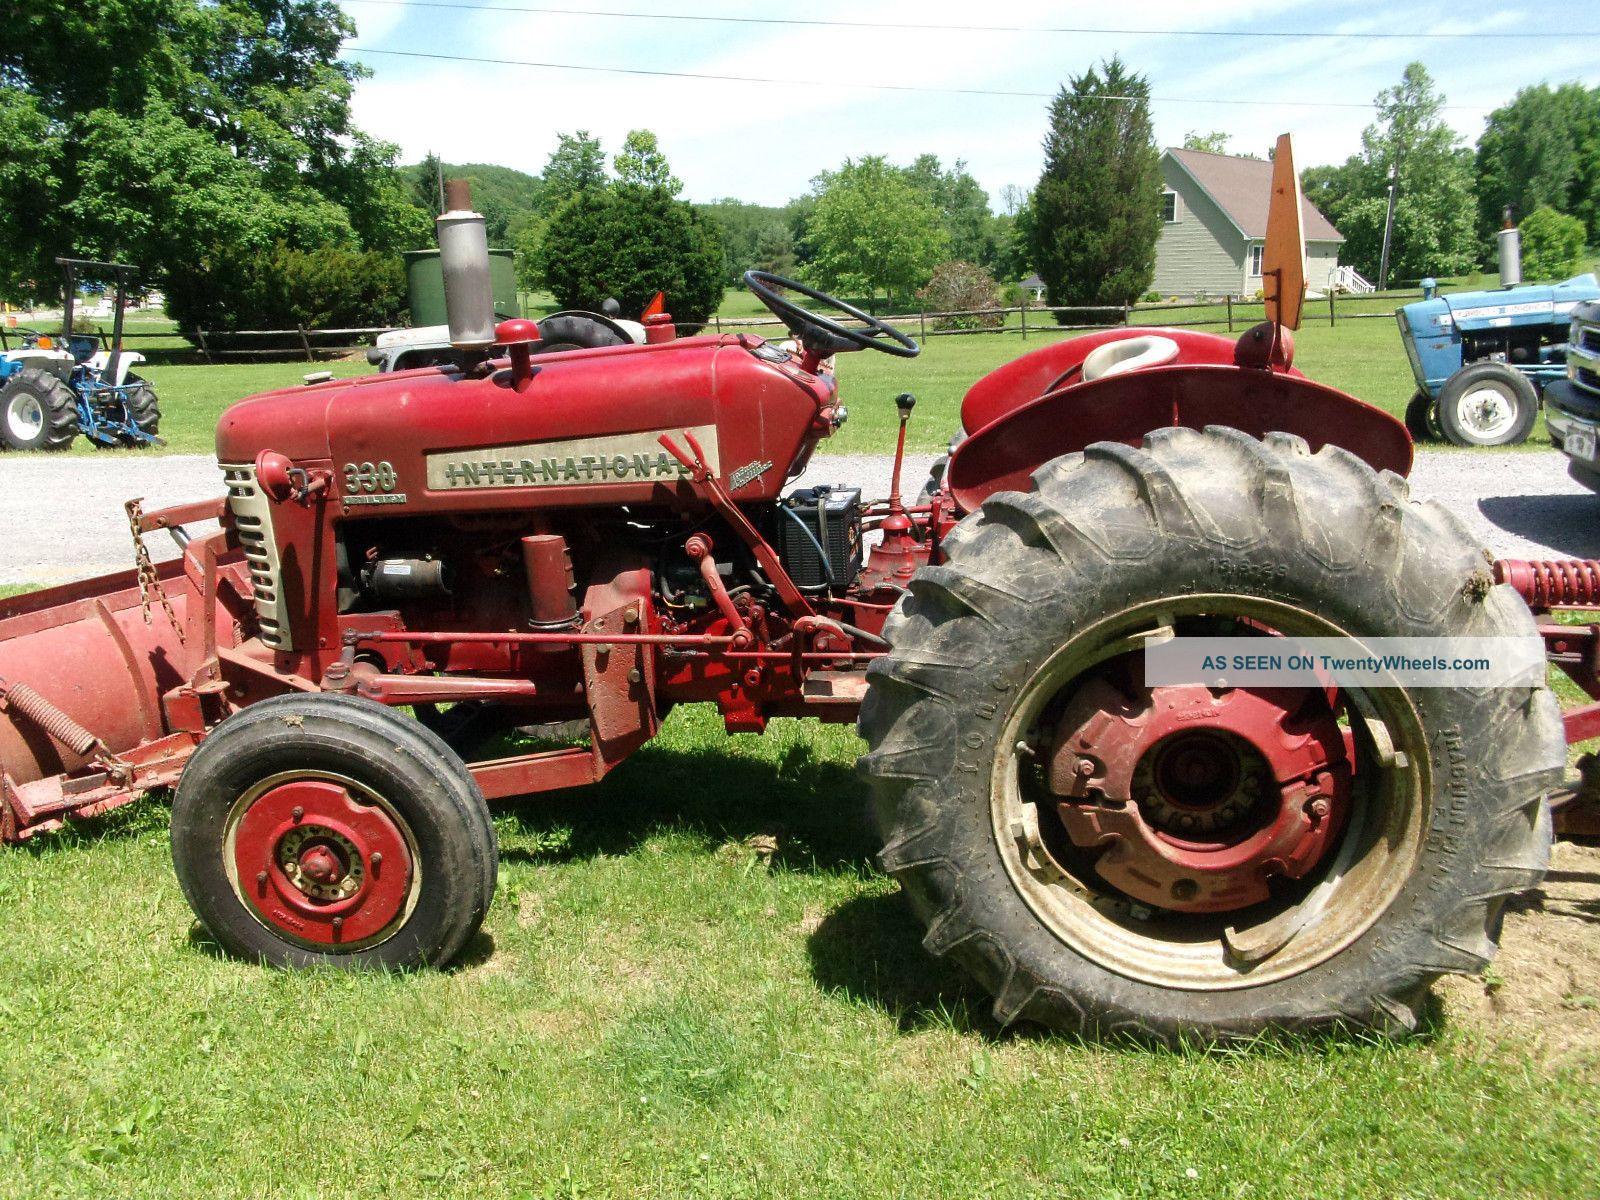 Antique International Tractor Wheel : Vintage farmall tubezzz porn photos